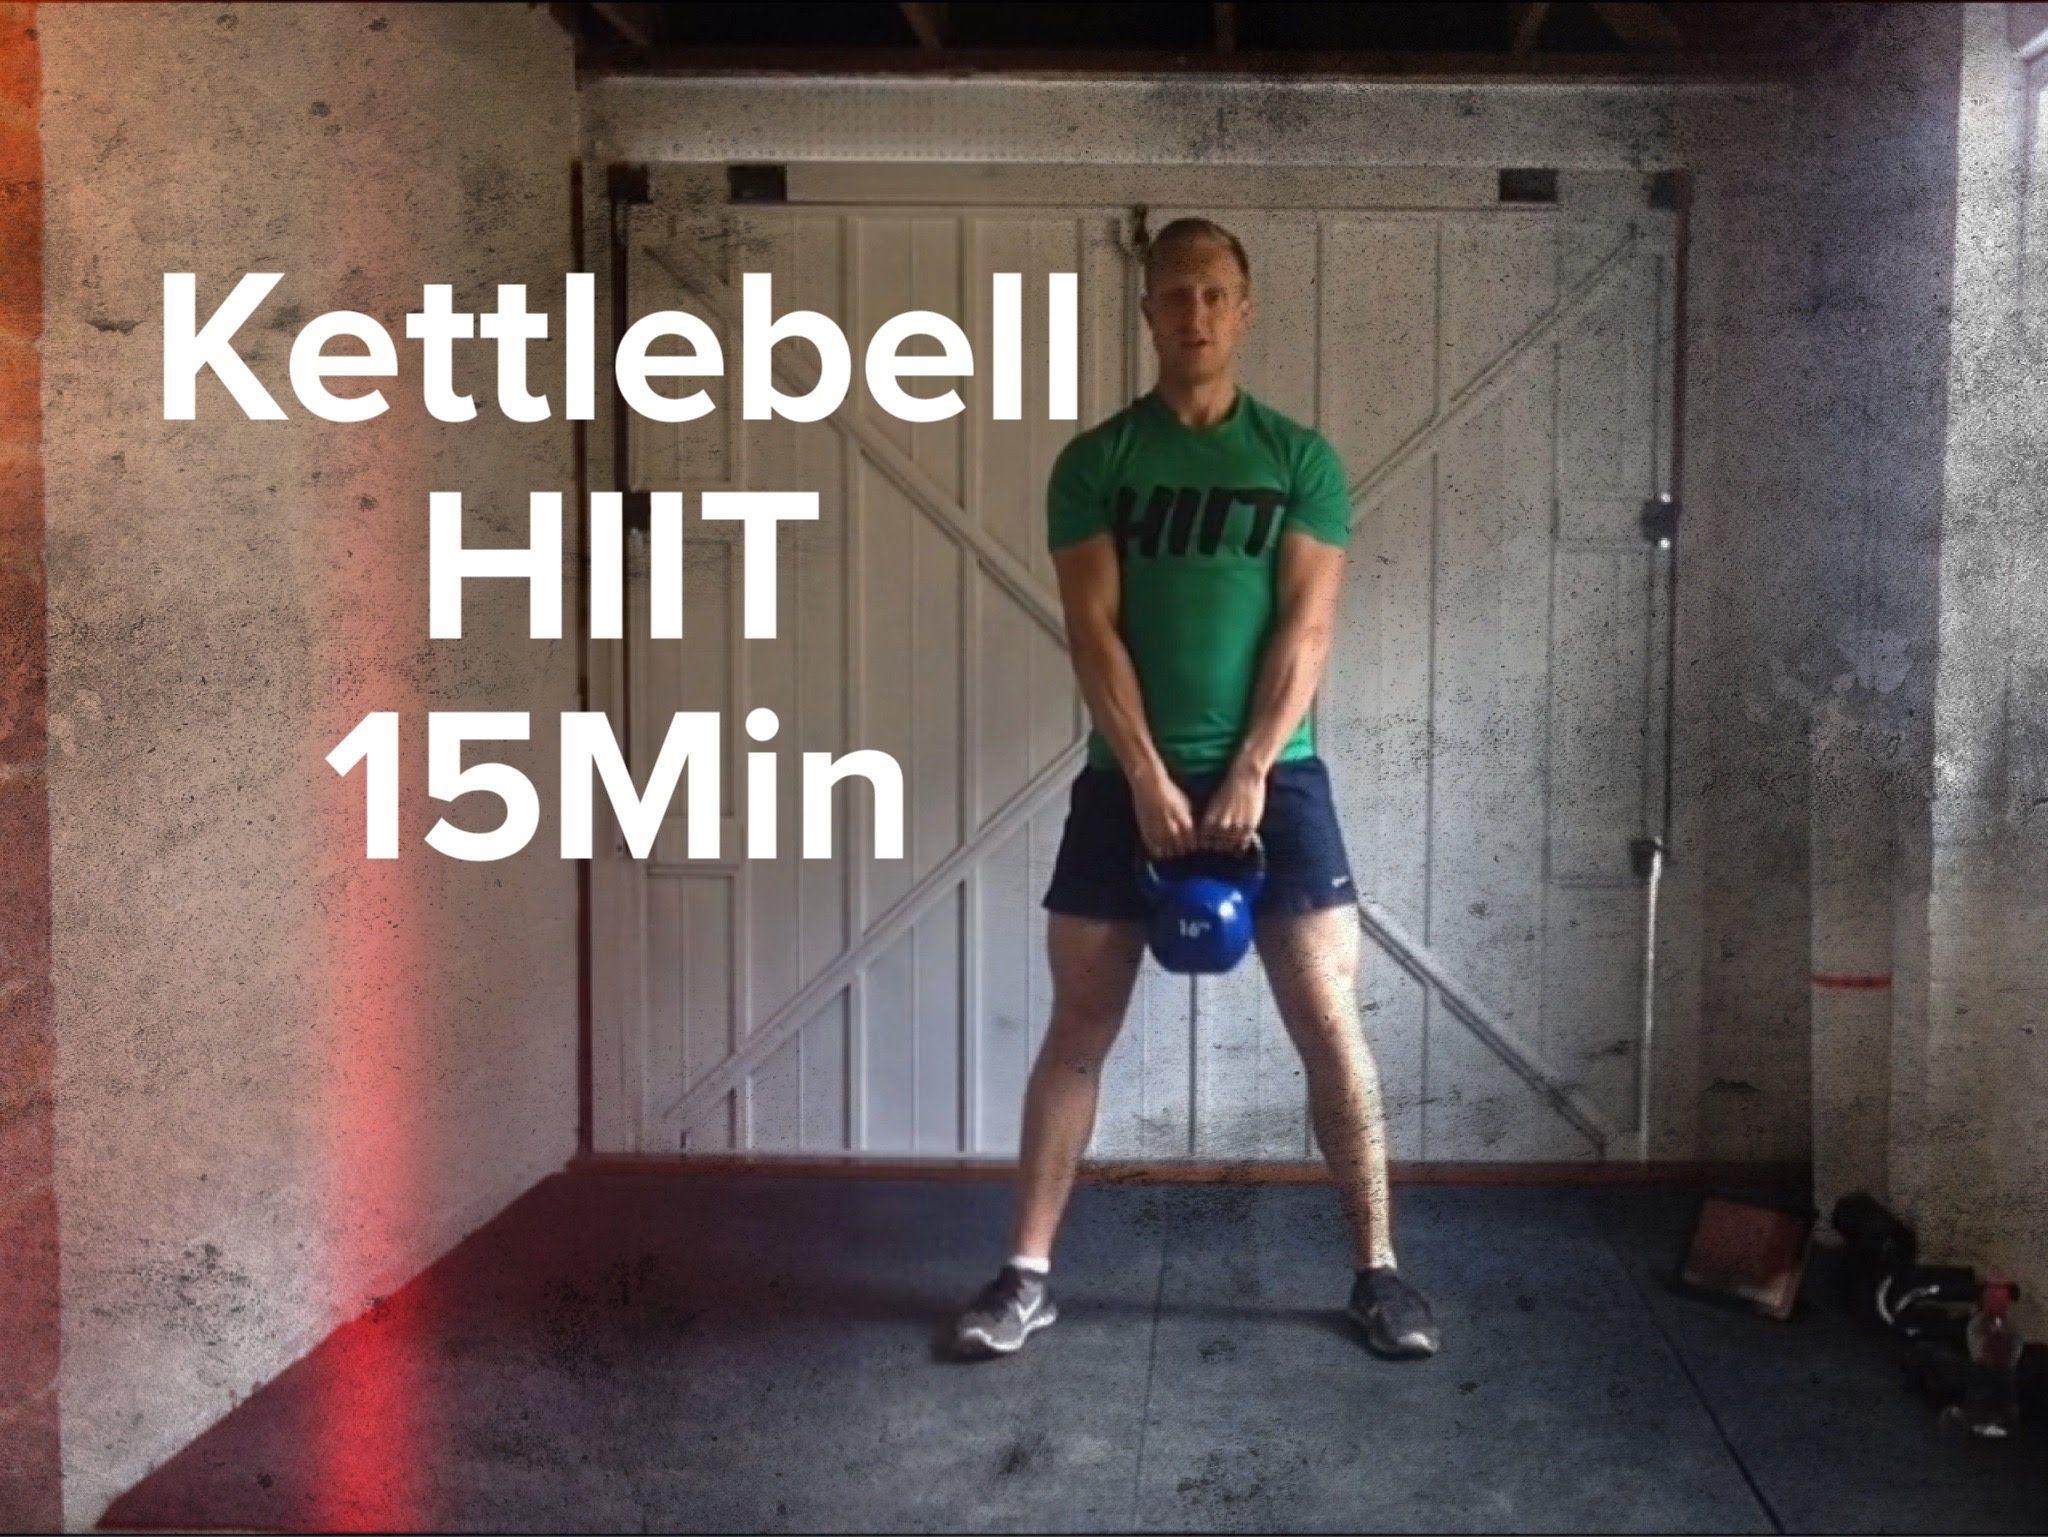 Kettlebell HIIT Workout 15Min | exercise | Pinterest | Watches ...